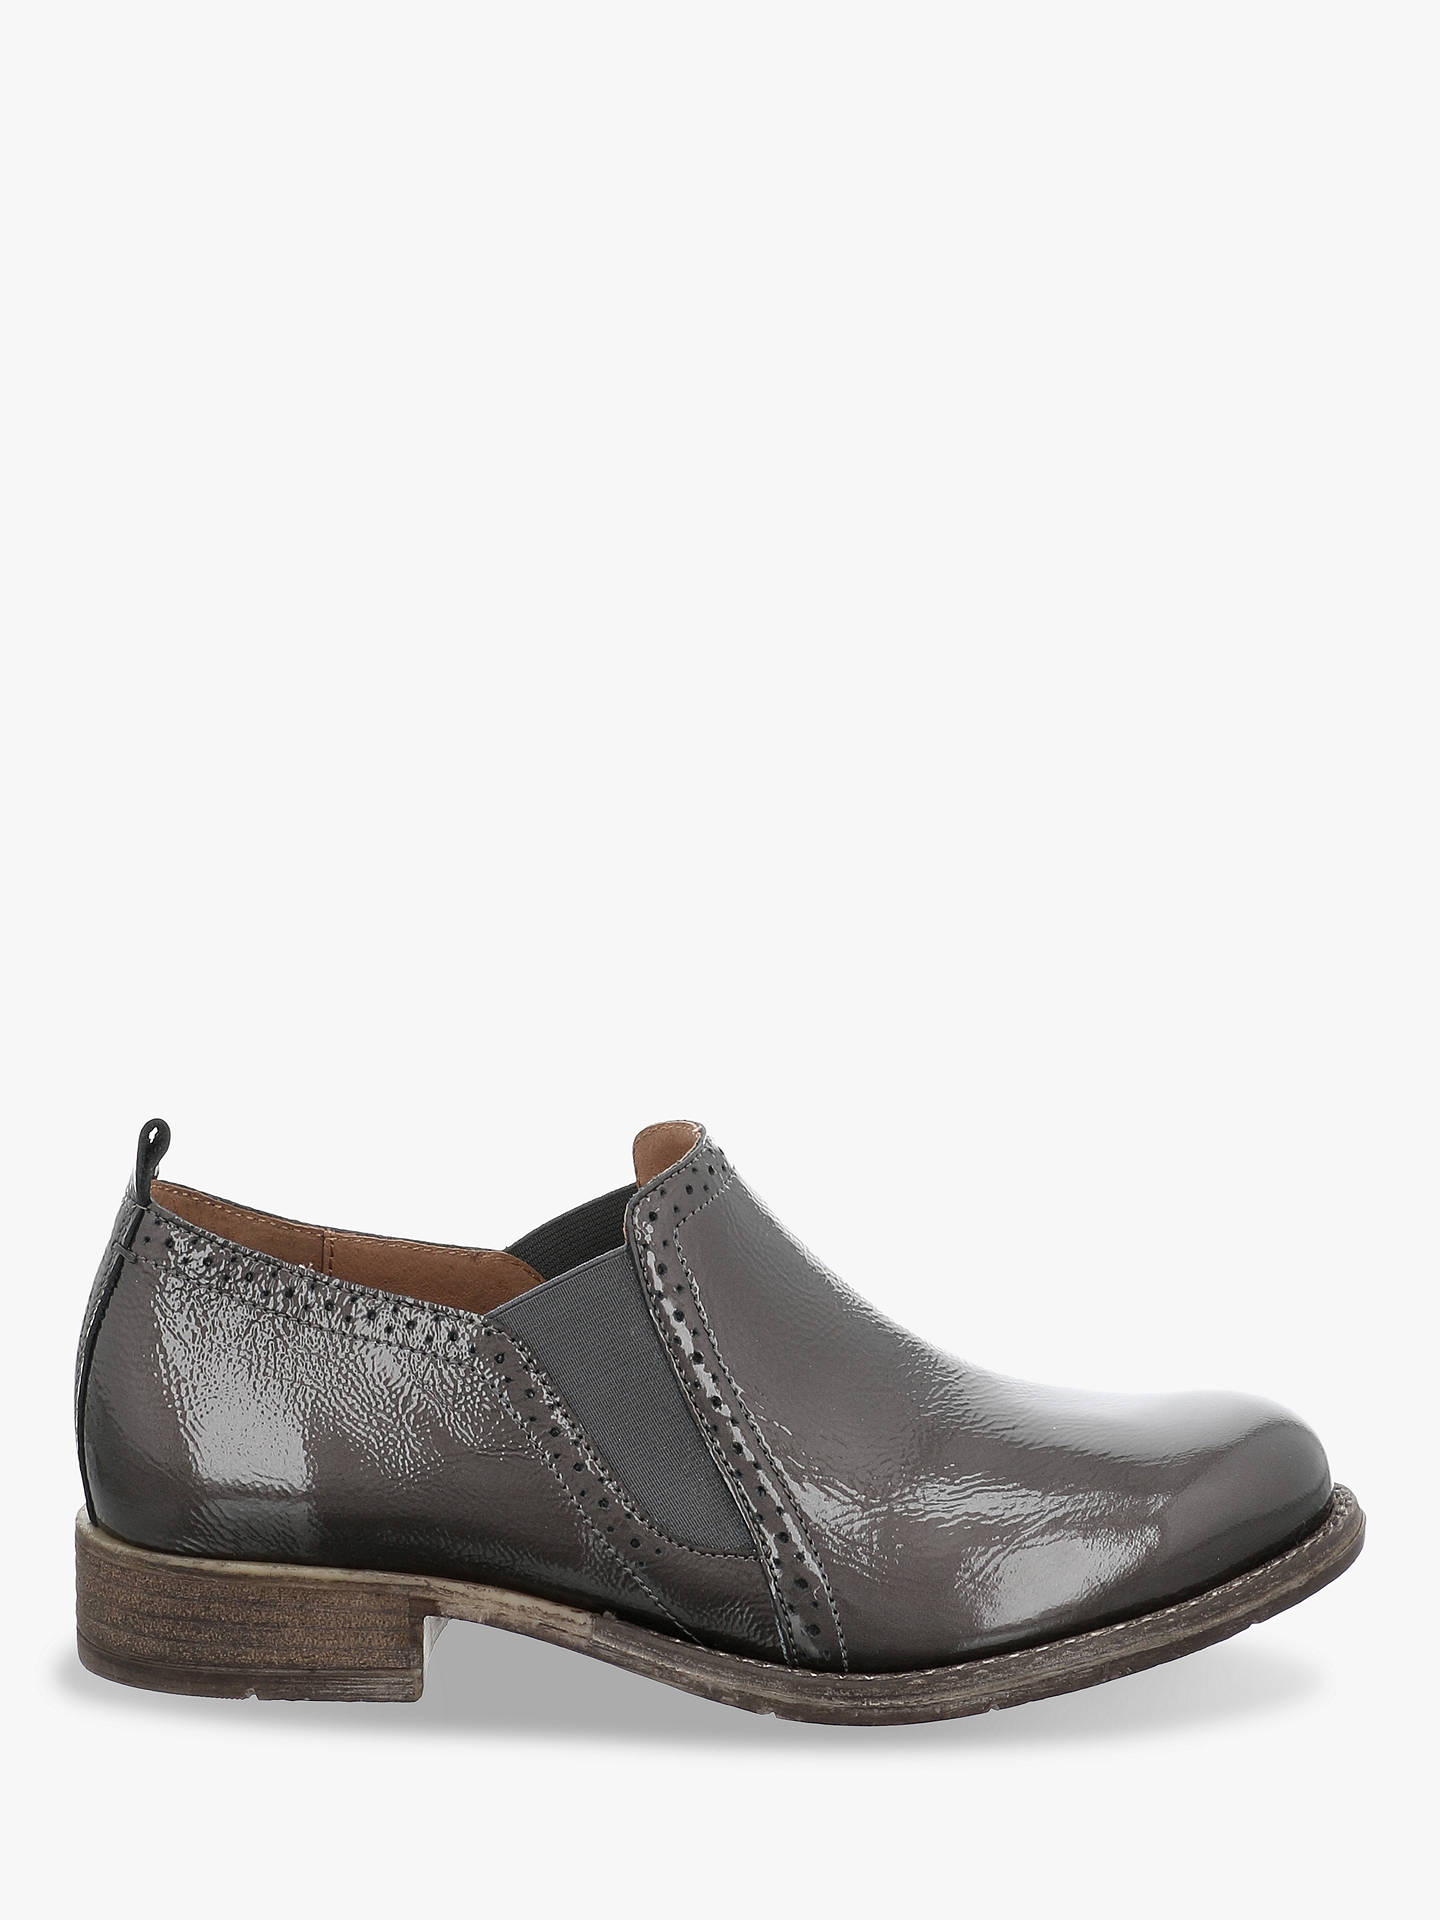 f1af12bd82449 Josef Seibel Sienna 91 Leather Brogues, Grey